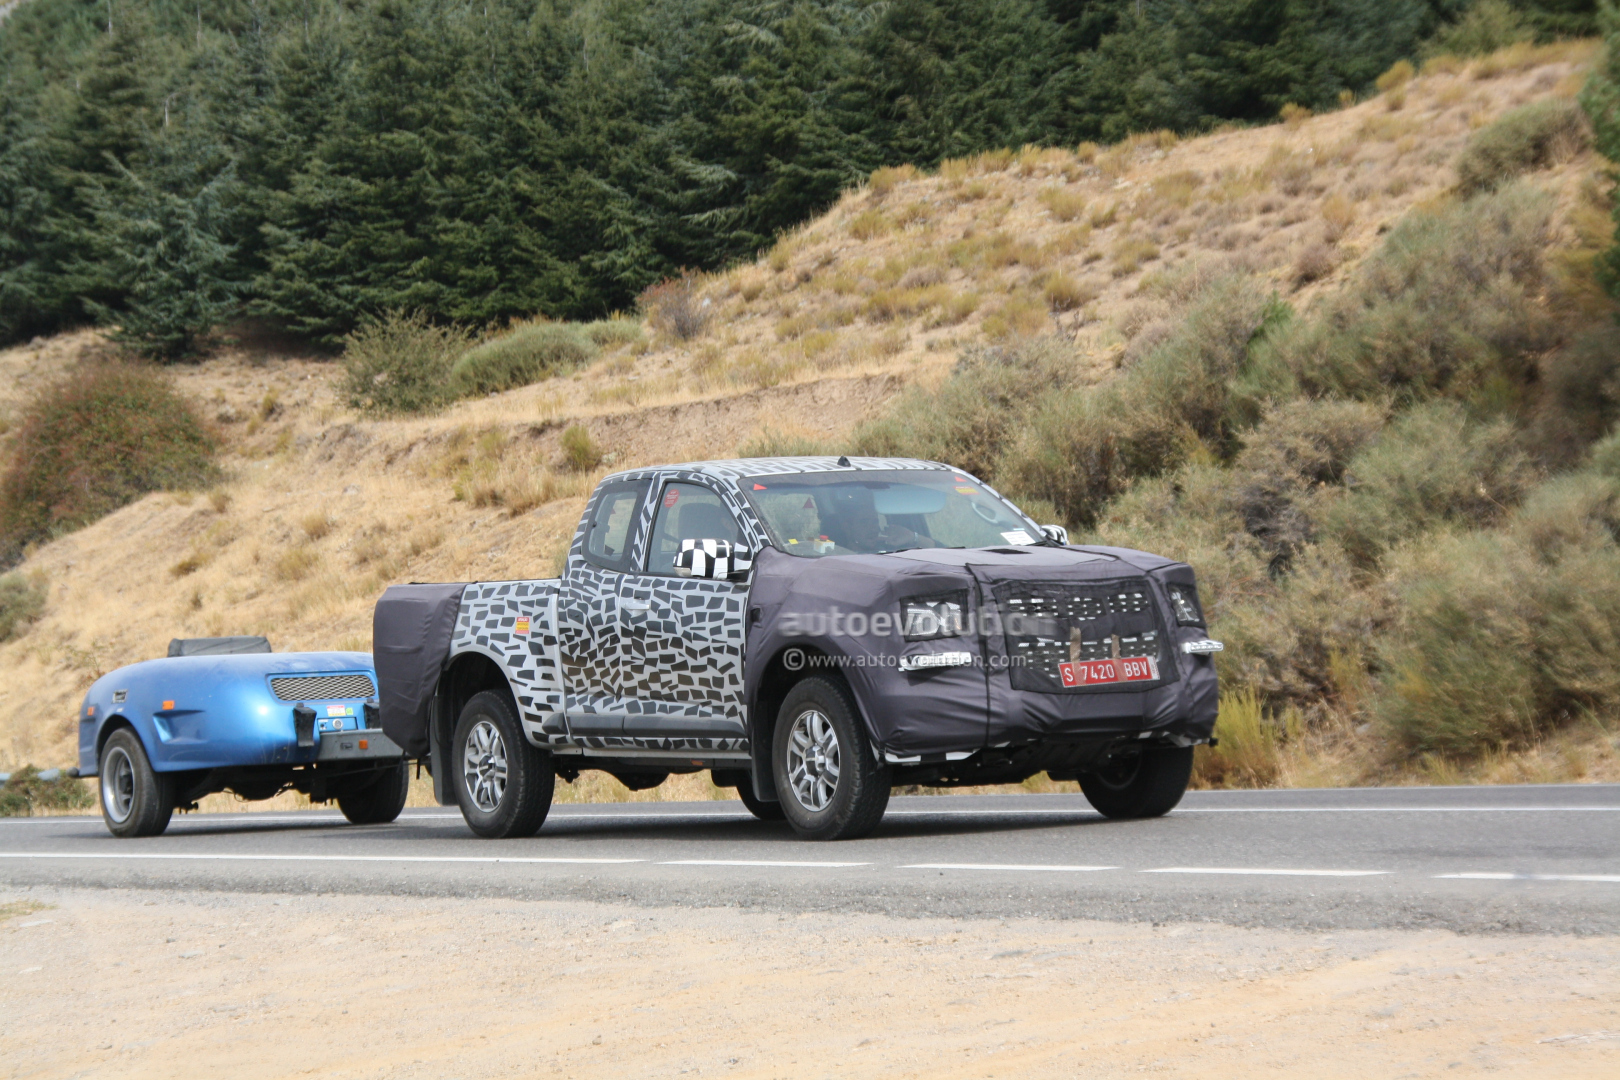 New 2022 Chevrolet Colorado ZR2 Bison, Price, Specs